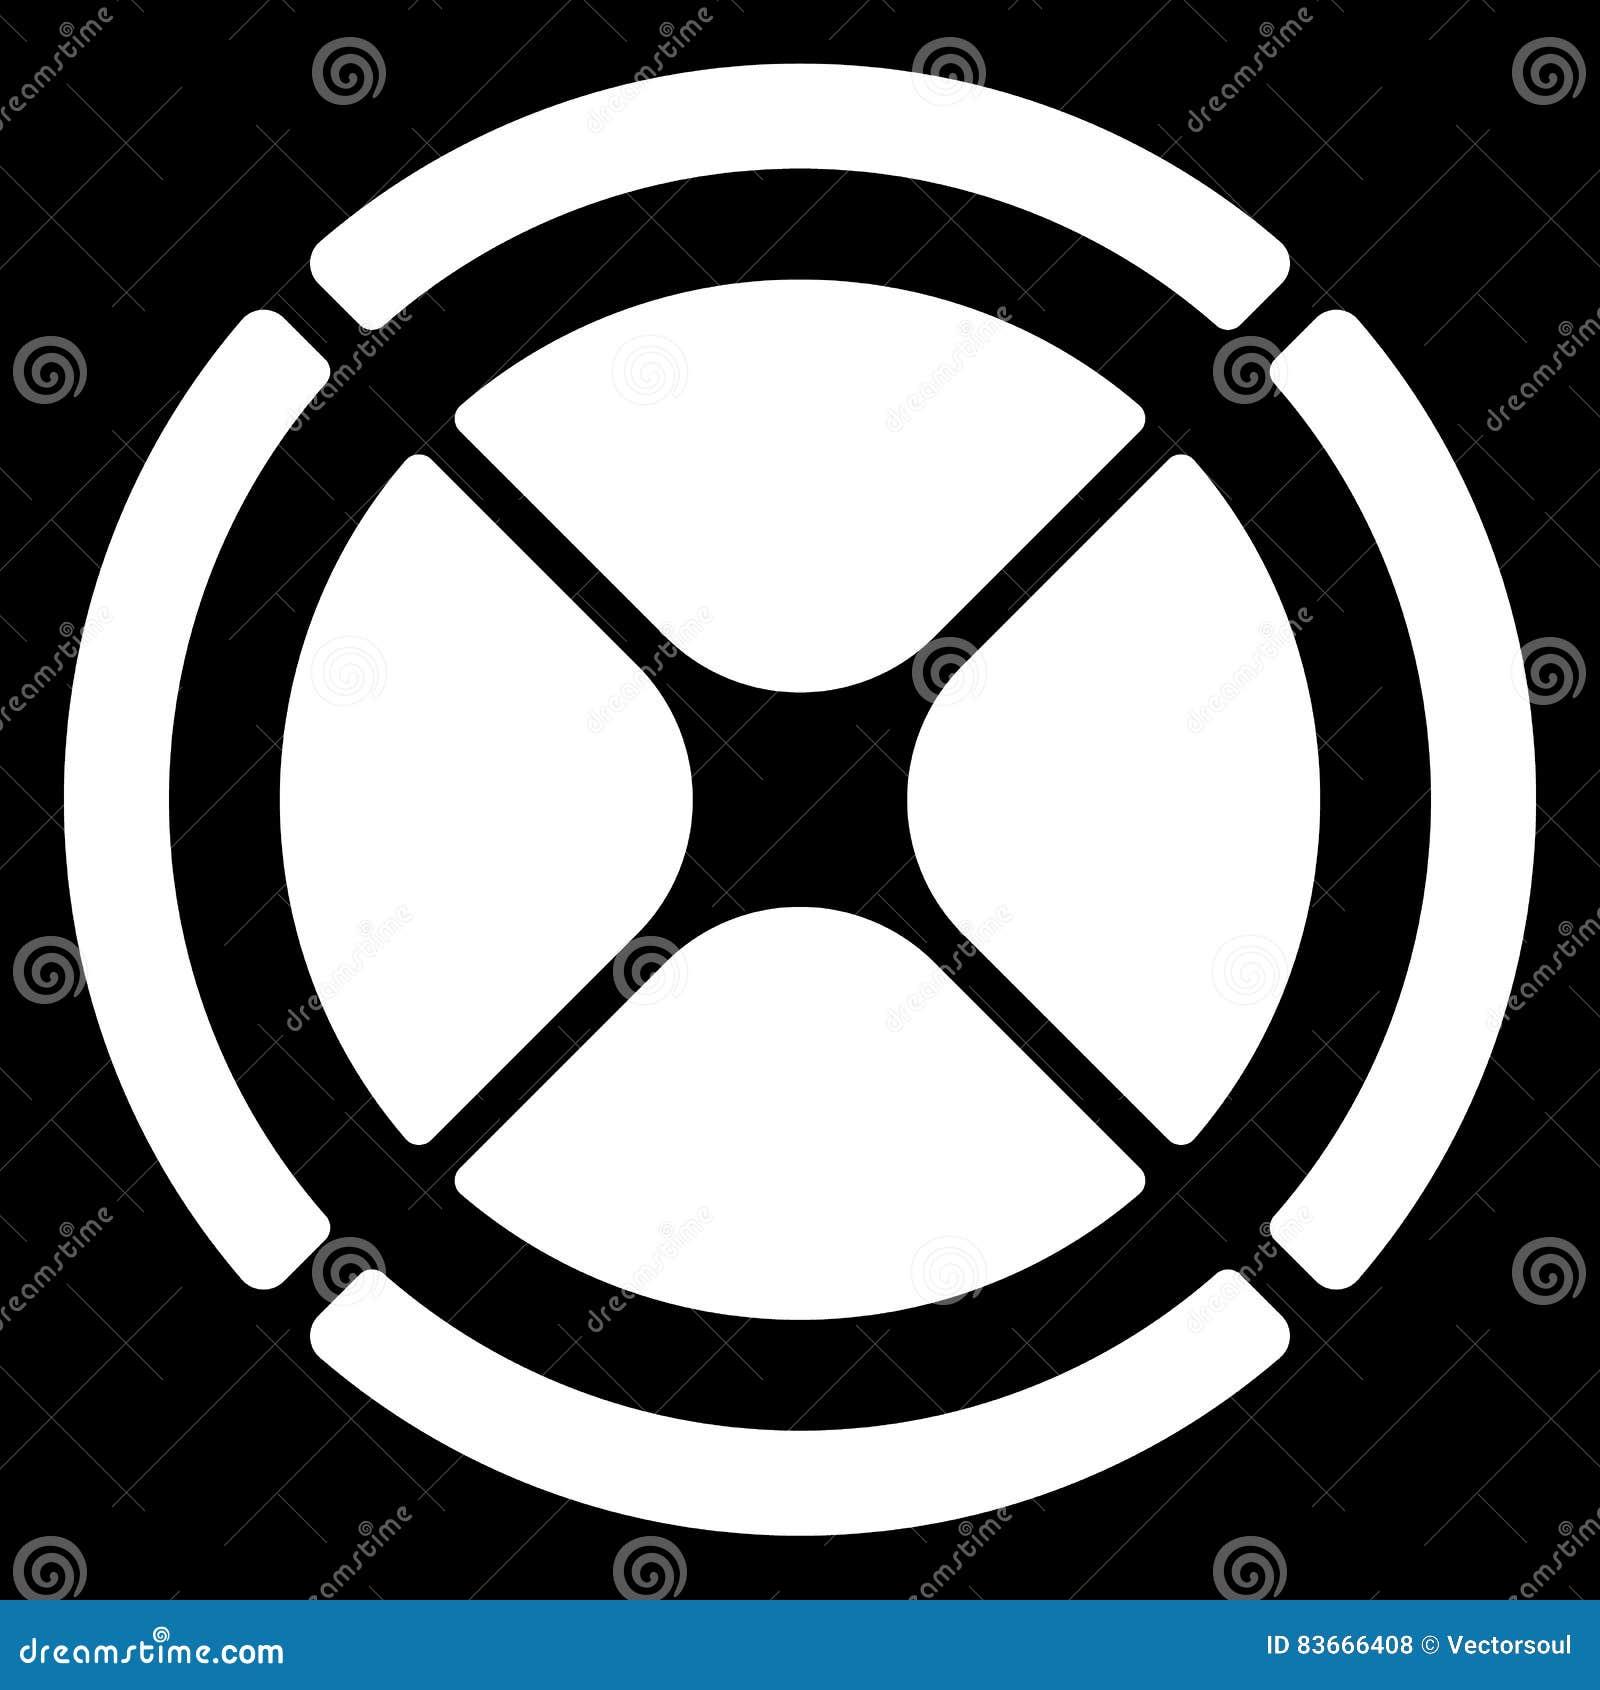 Segmented Circle Cross Hair Target Symbol Chart Template Gui